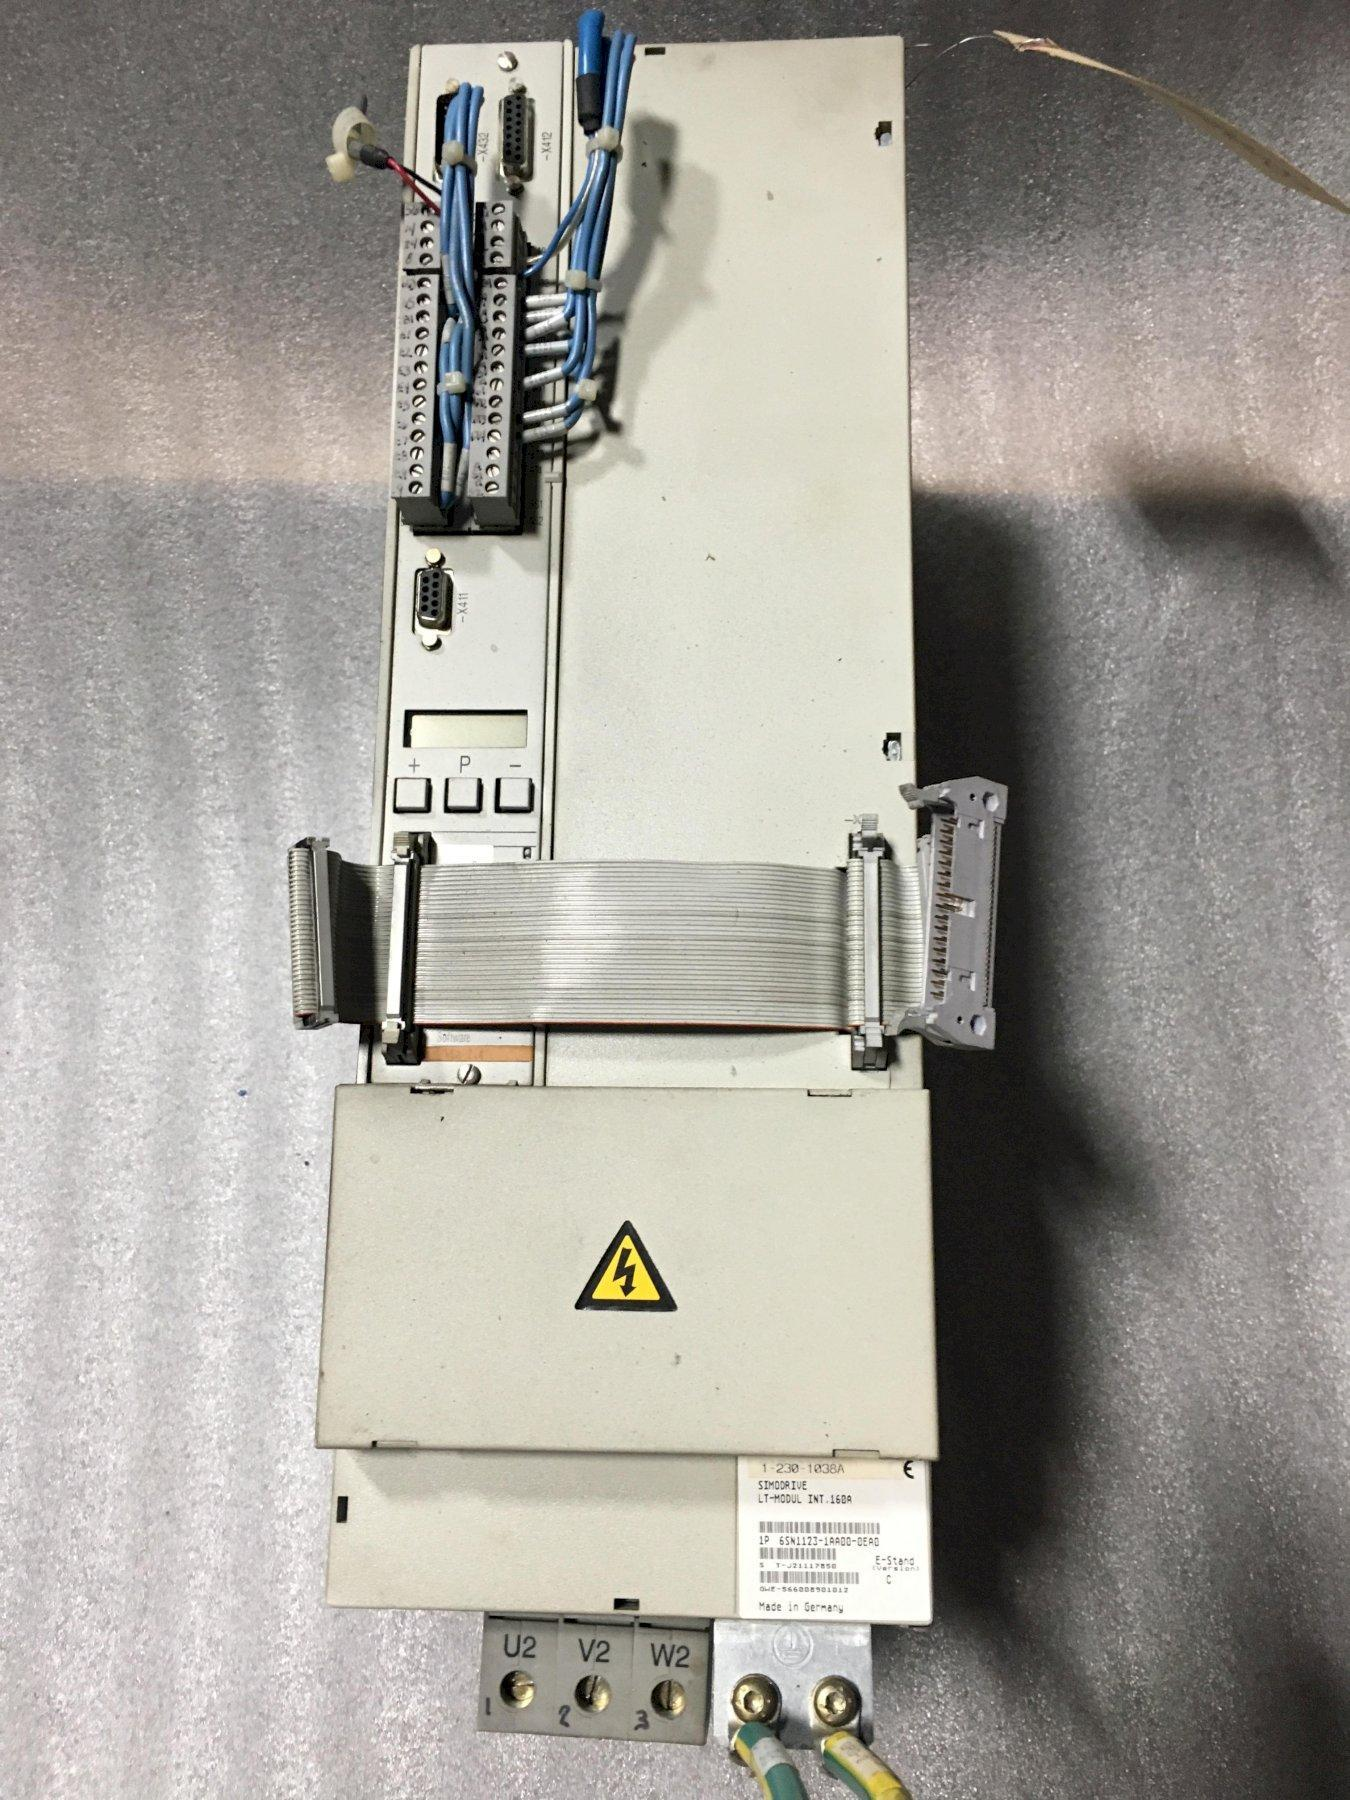 SIMODRIVE 611 LT-MODUL INT 160A, Version C, 1 Axis Power Module.